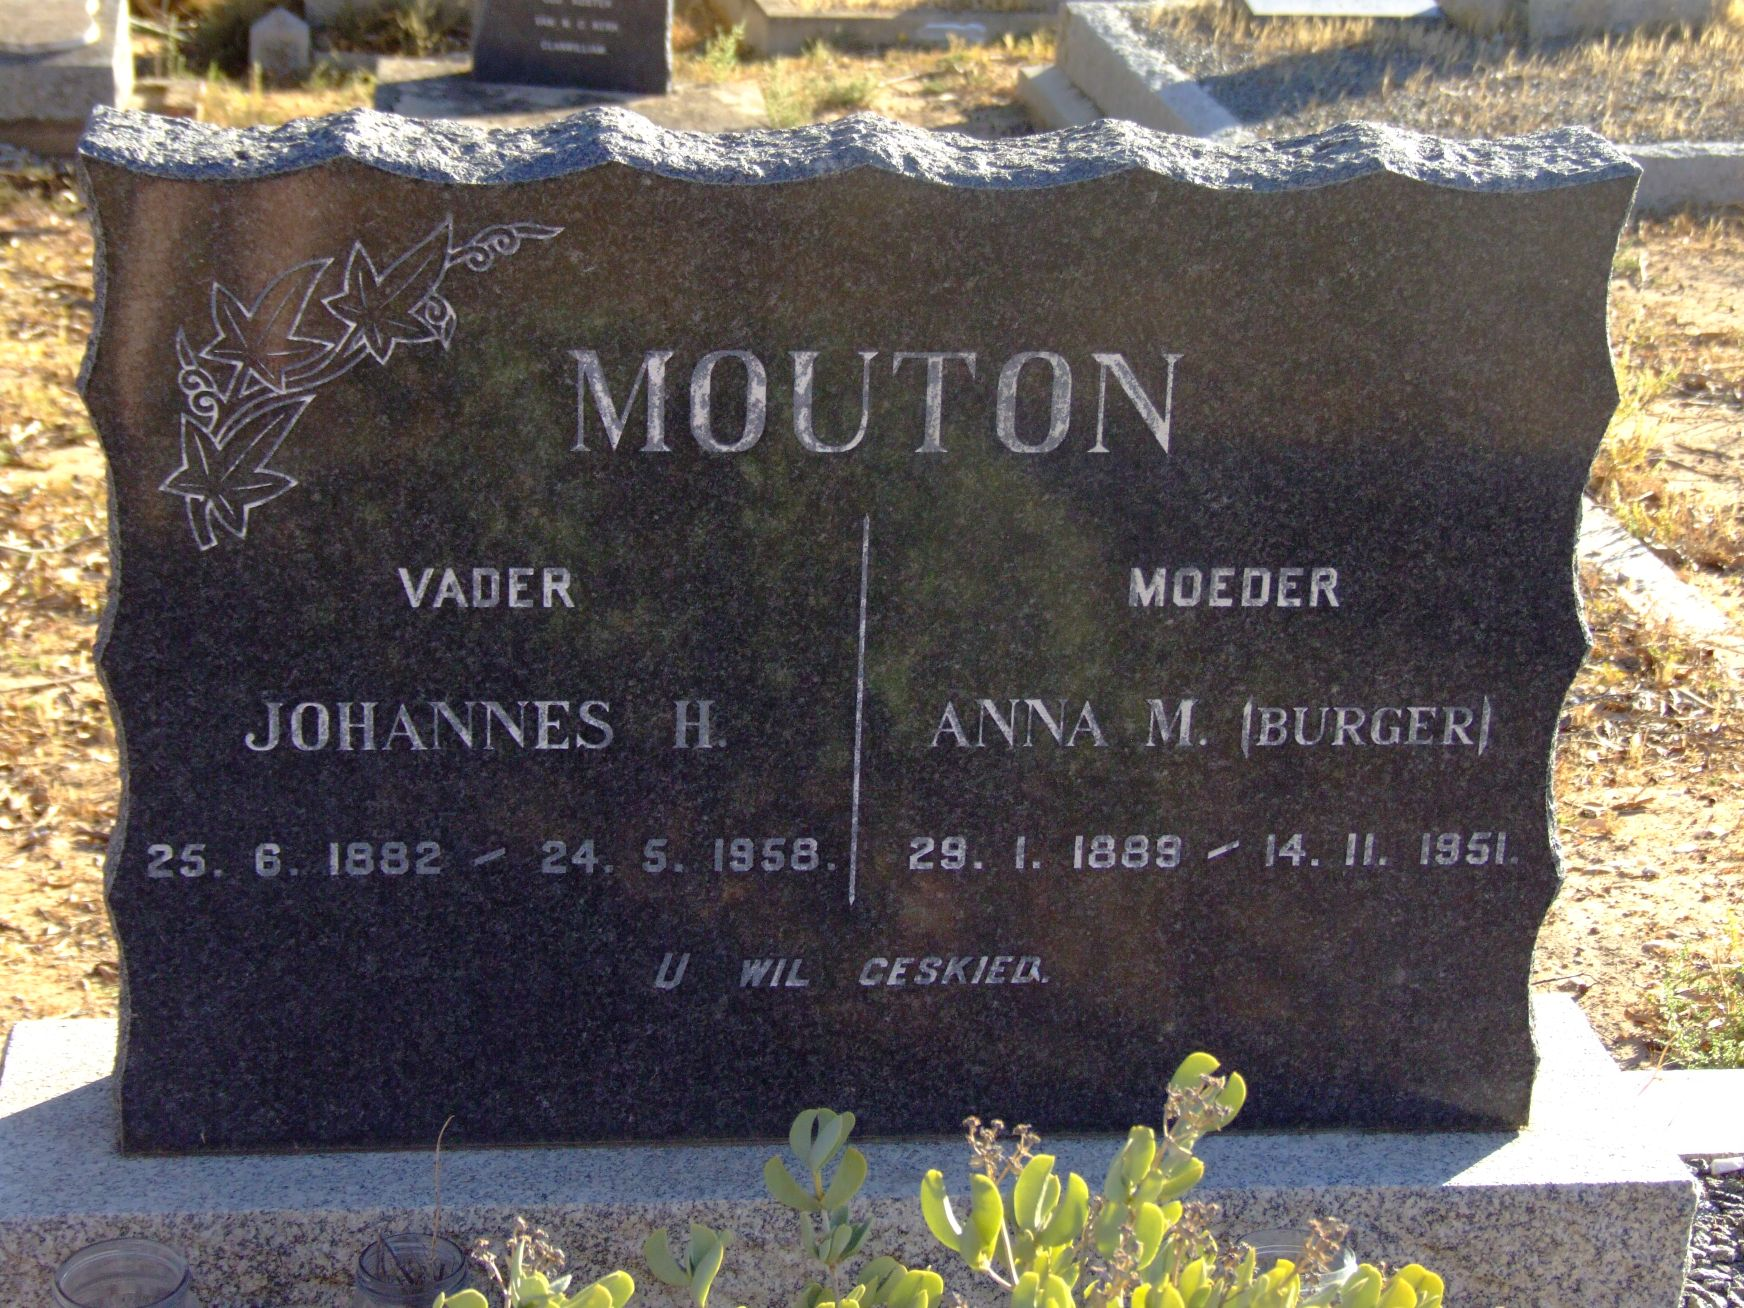 Mouton, Johannes H. and Mouton, Anna M. (nee Burger)